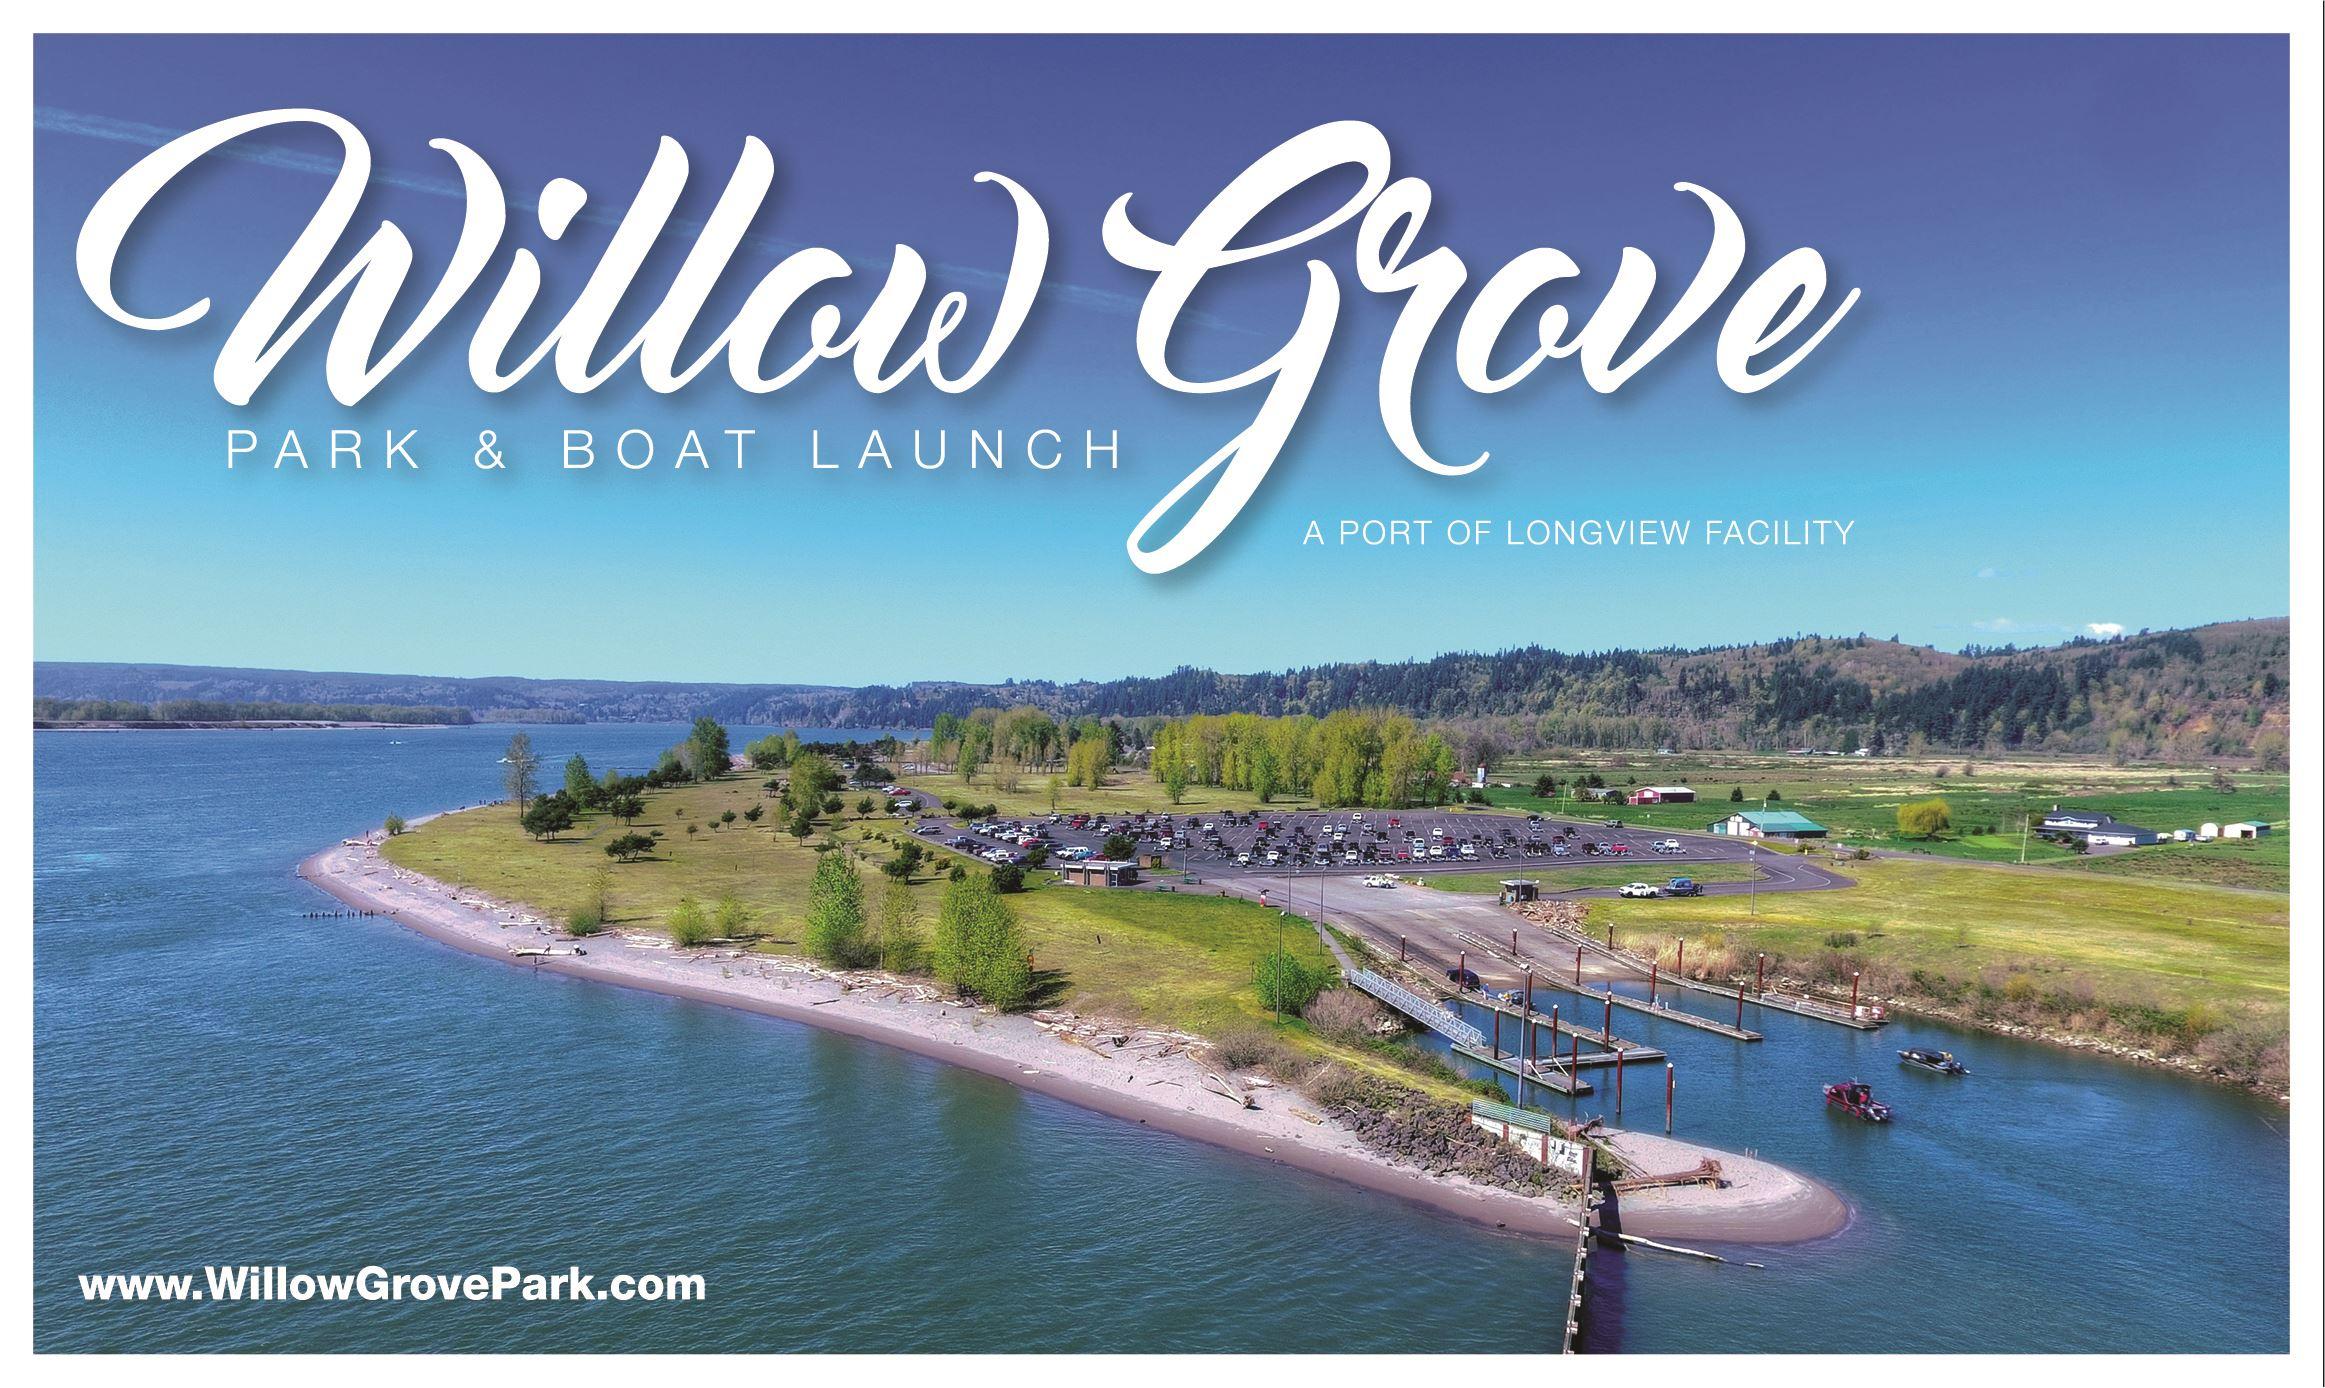 a1086adb5f91b Willow Grove Park & Boat Launch | Port of Longview, WA